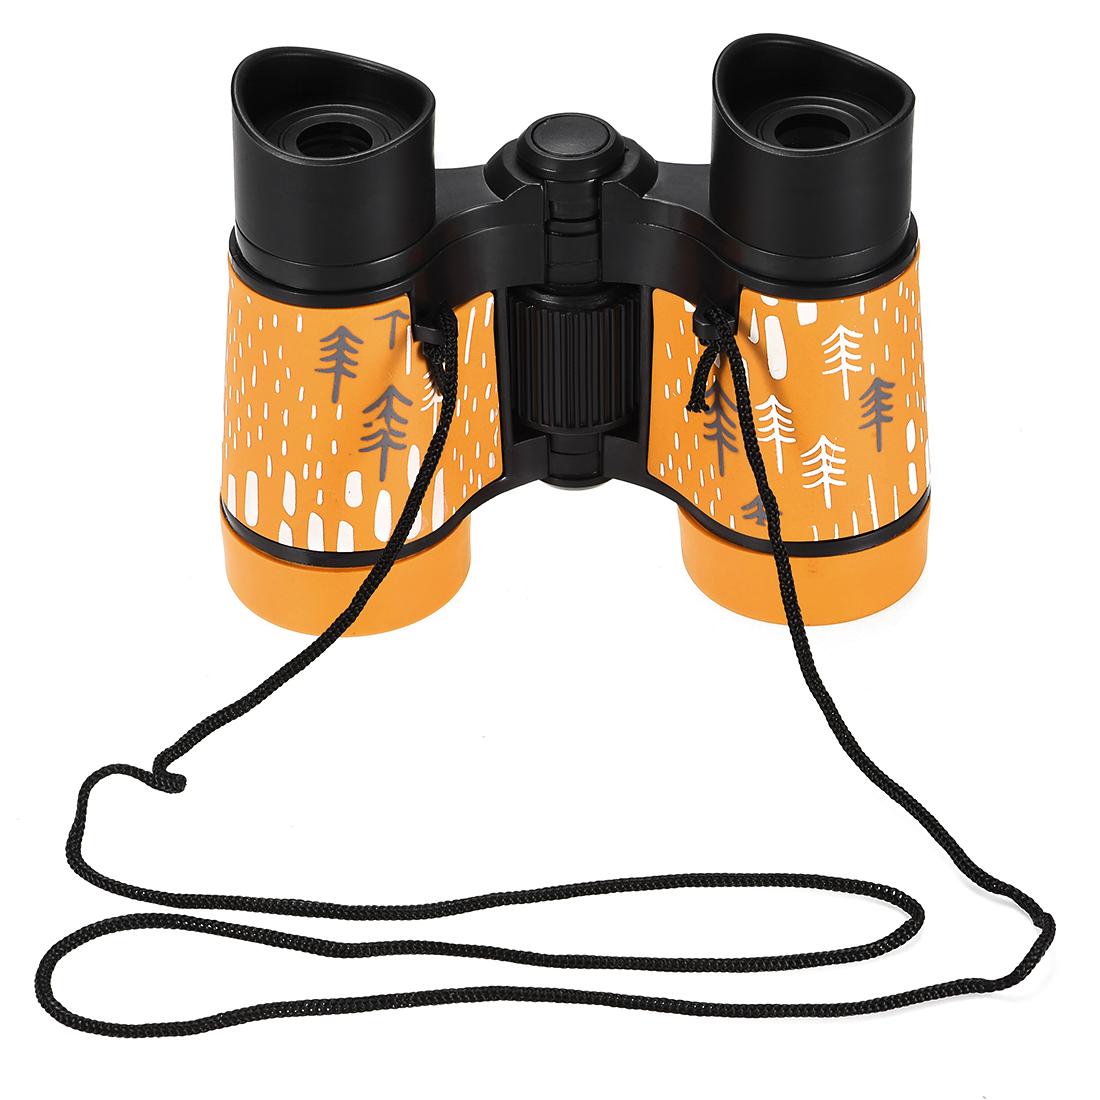 Toy Binoculars 4X30 Compact Folding Binoculars Shockproof Orange with Neck Strap